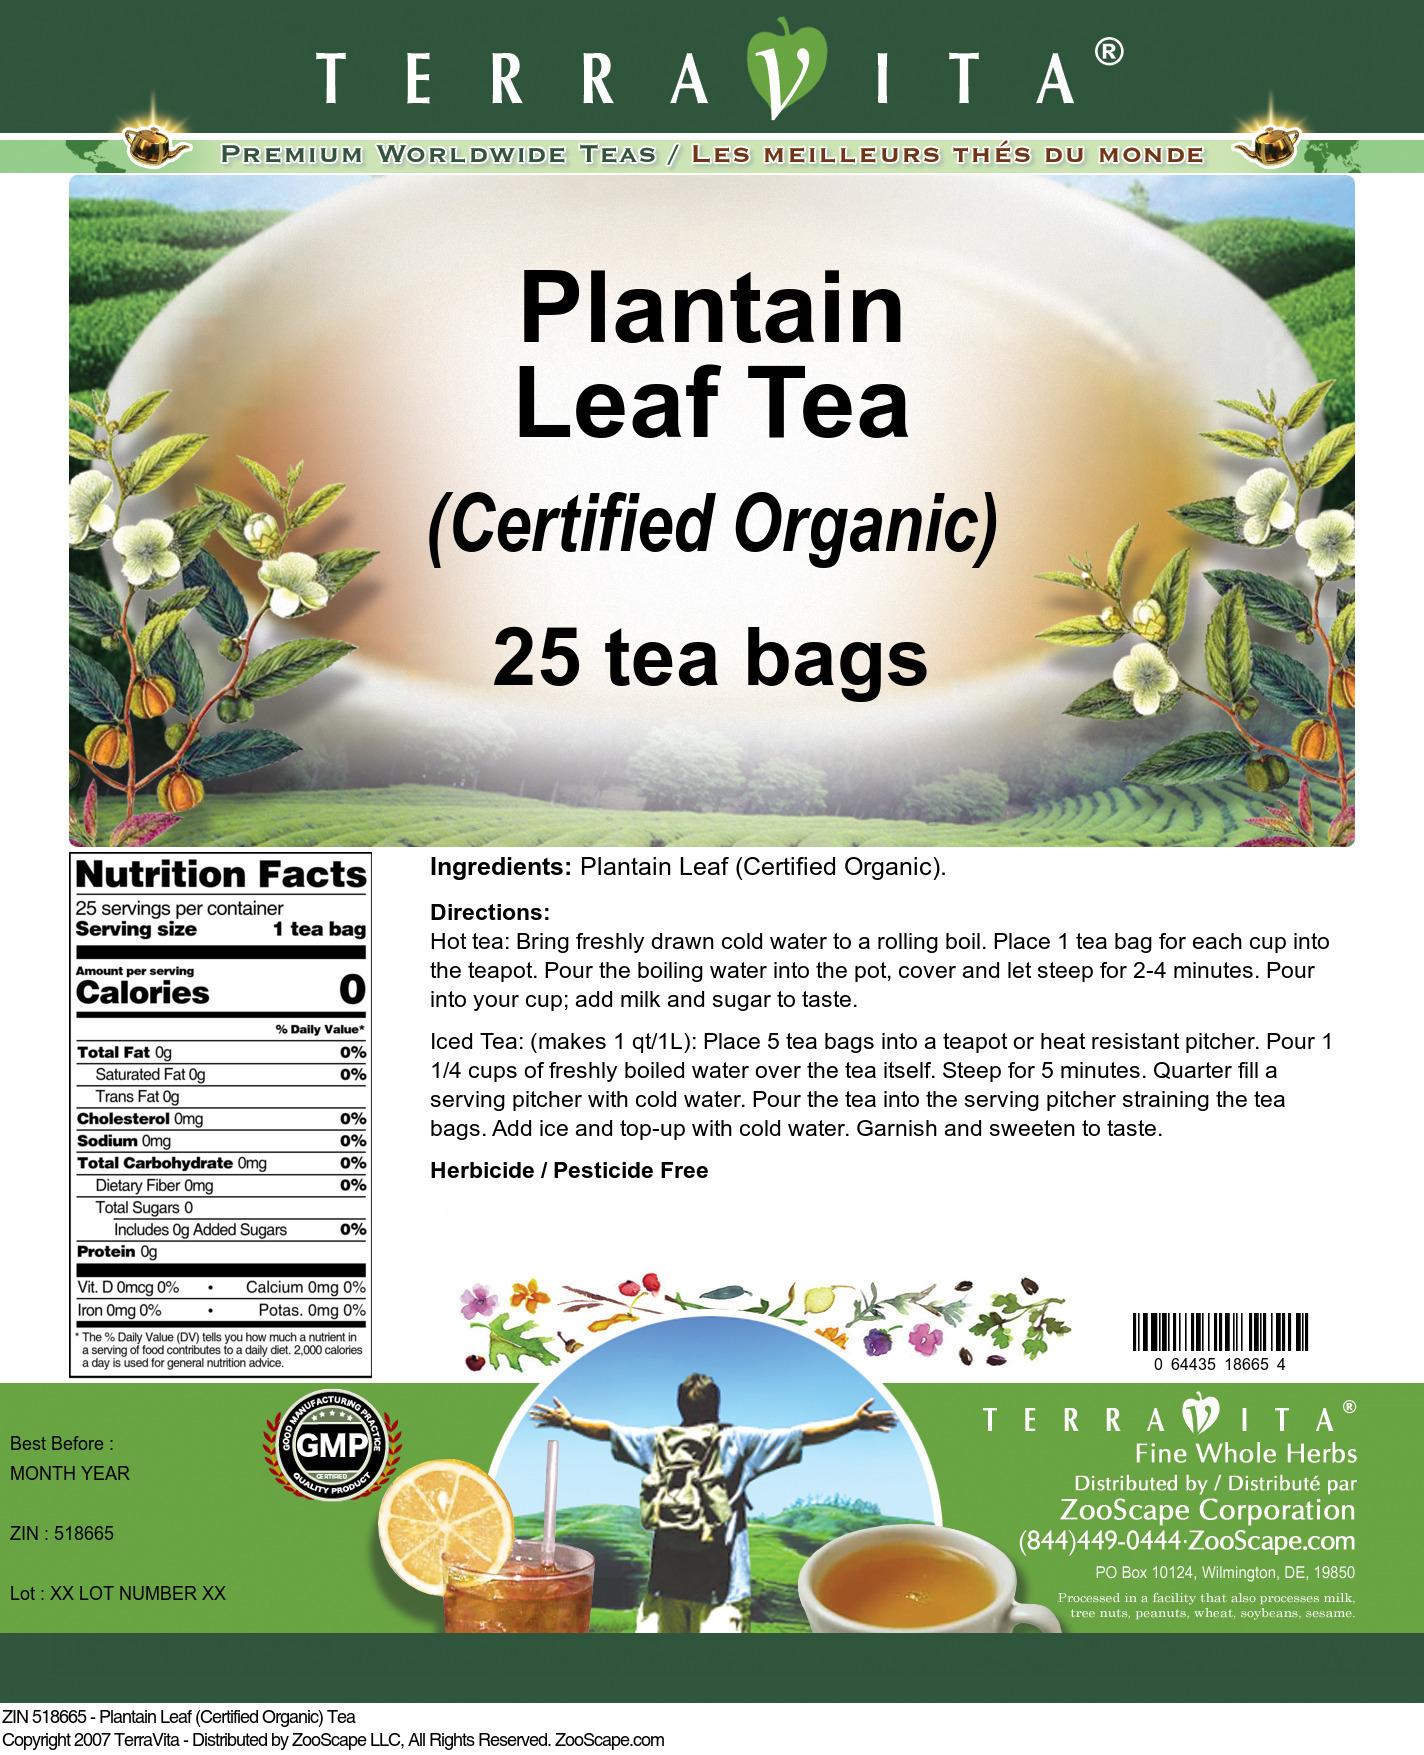 Plantain Leaf (Certified Organic) Tea